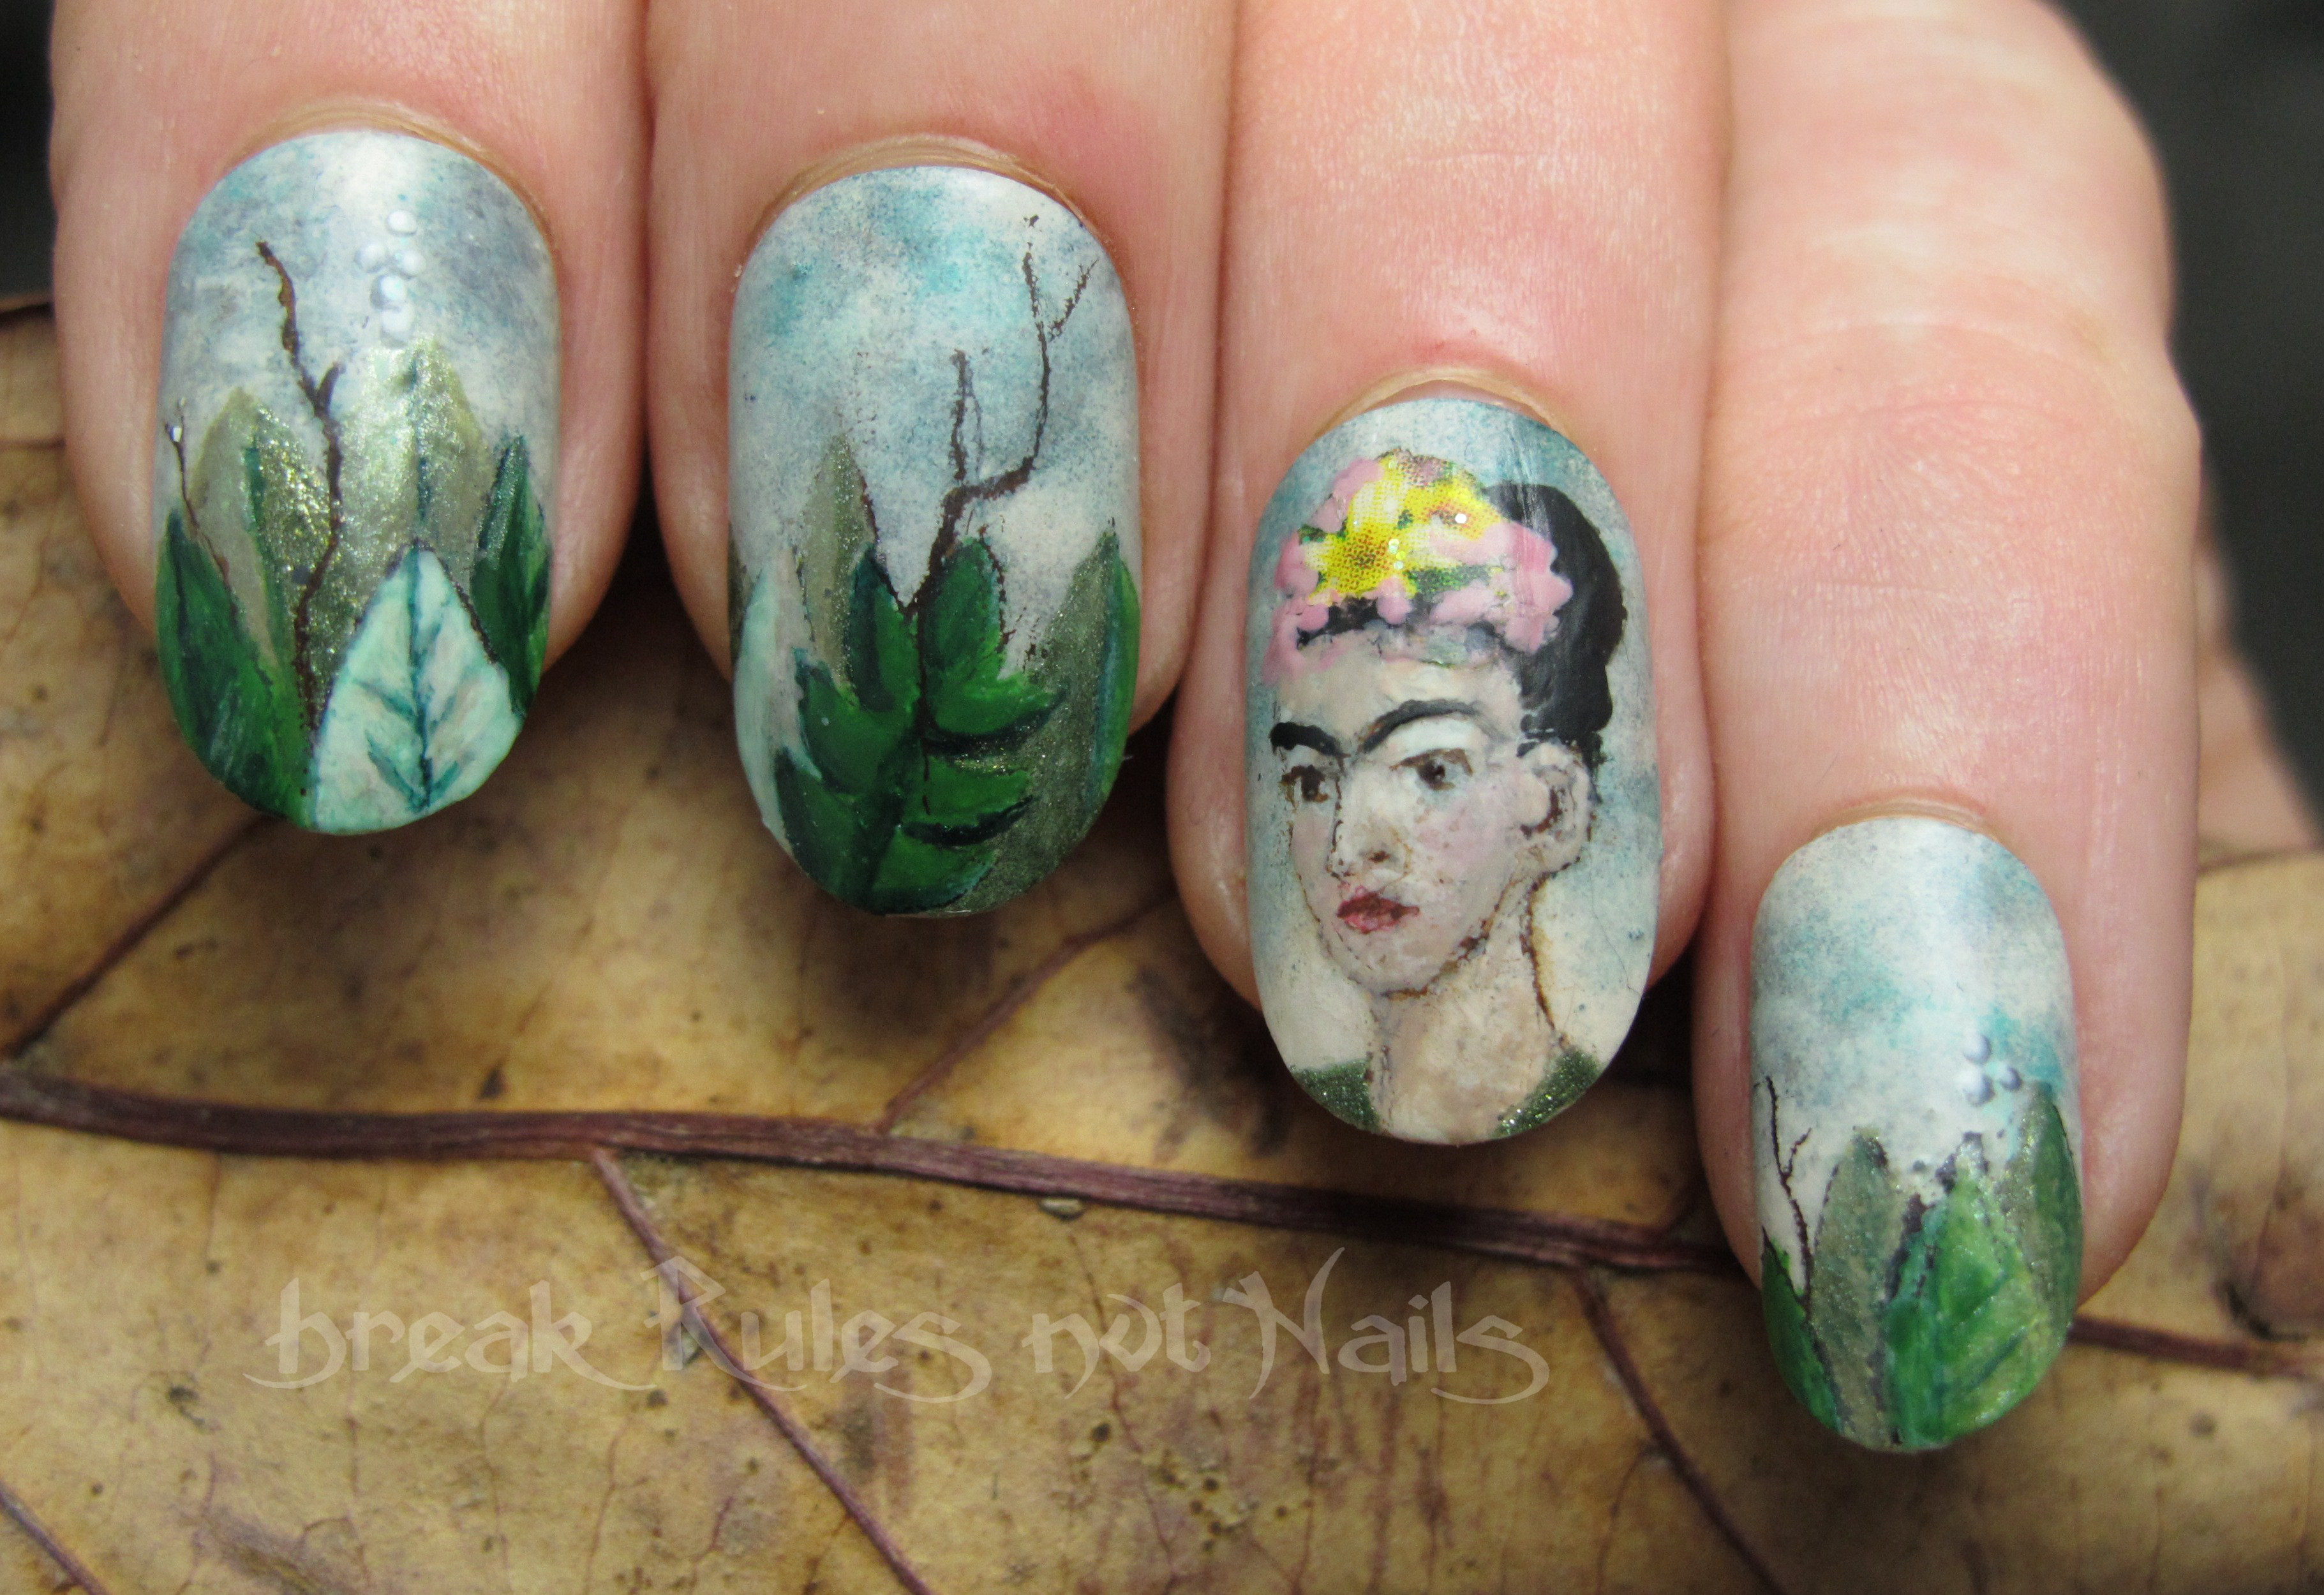 Frida Kahlo nail art   Break rules, not nails